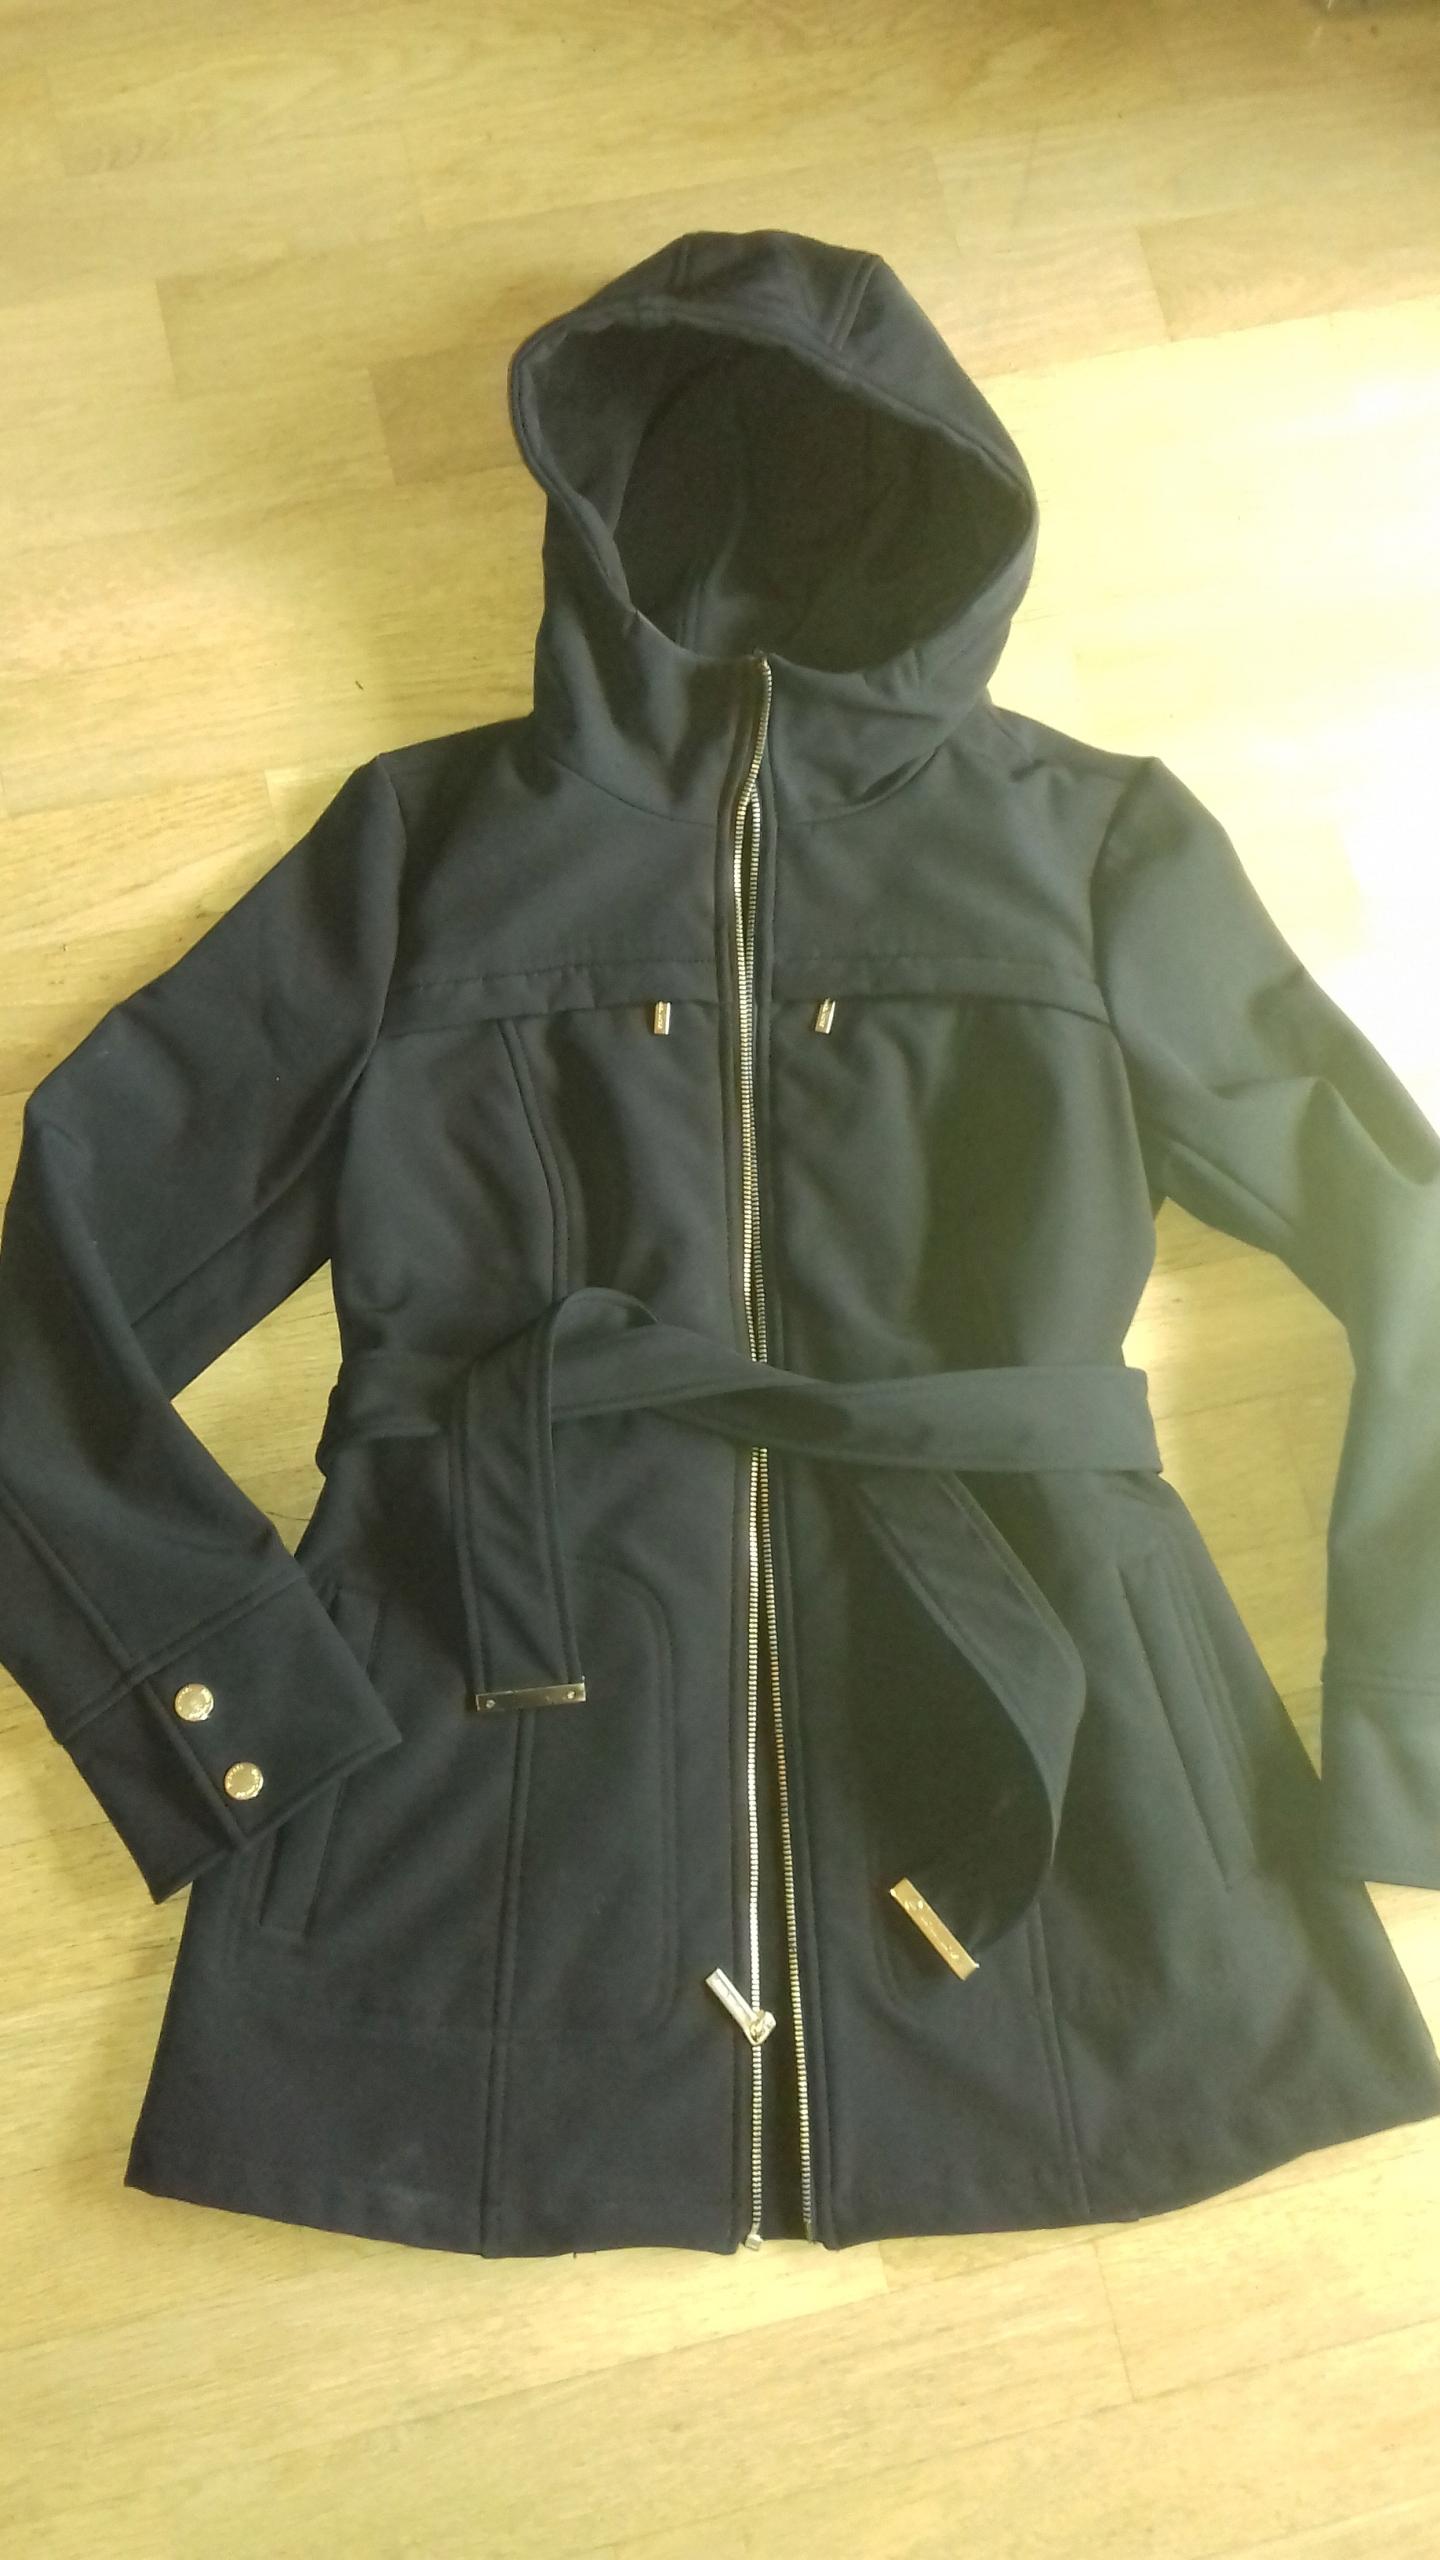 f0a9ab0754fde Michael Kors 36 j nowa kurtka płaszcz softshell - 7638168470 ...